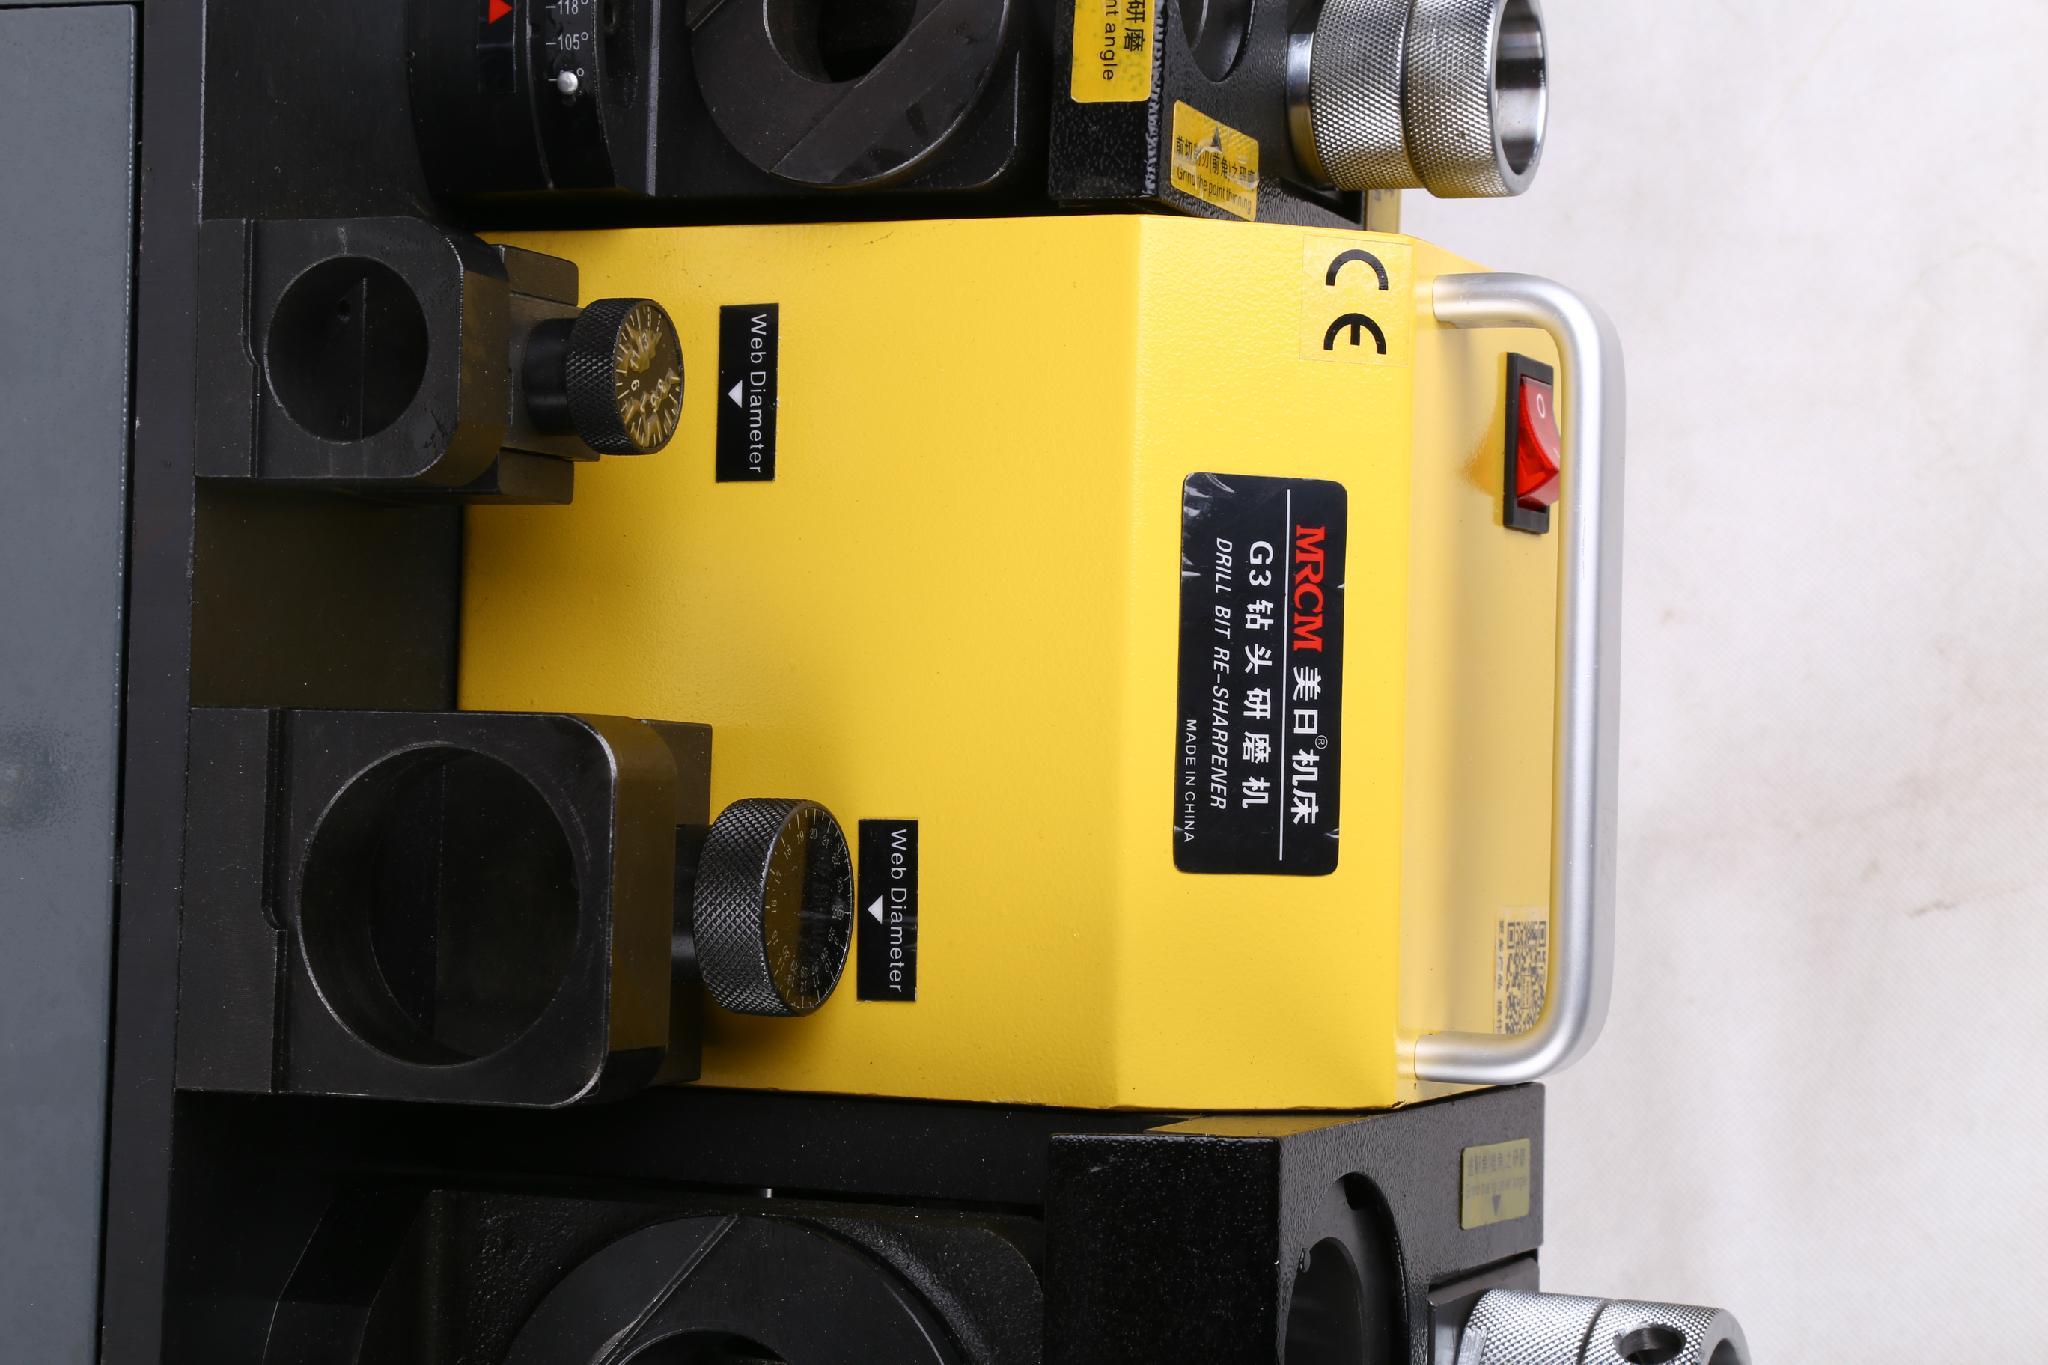 ф3-32復合鑽頭研磨機 4